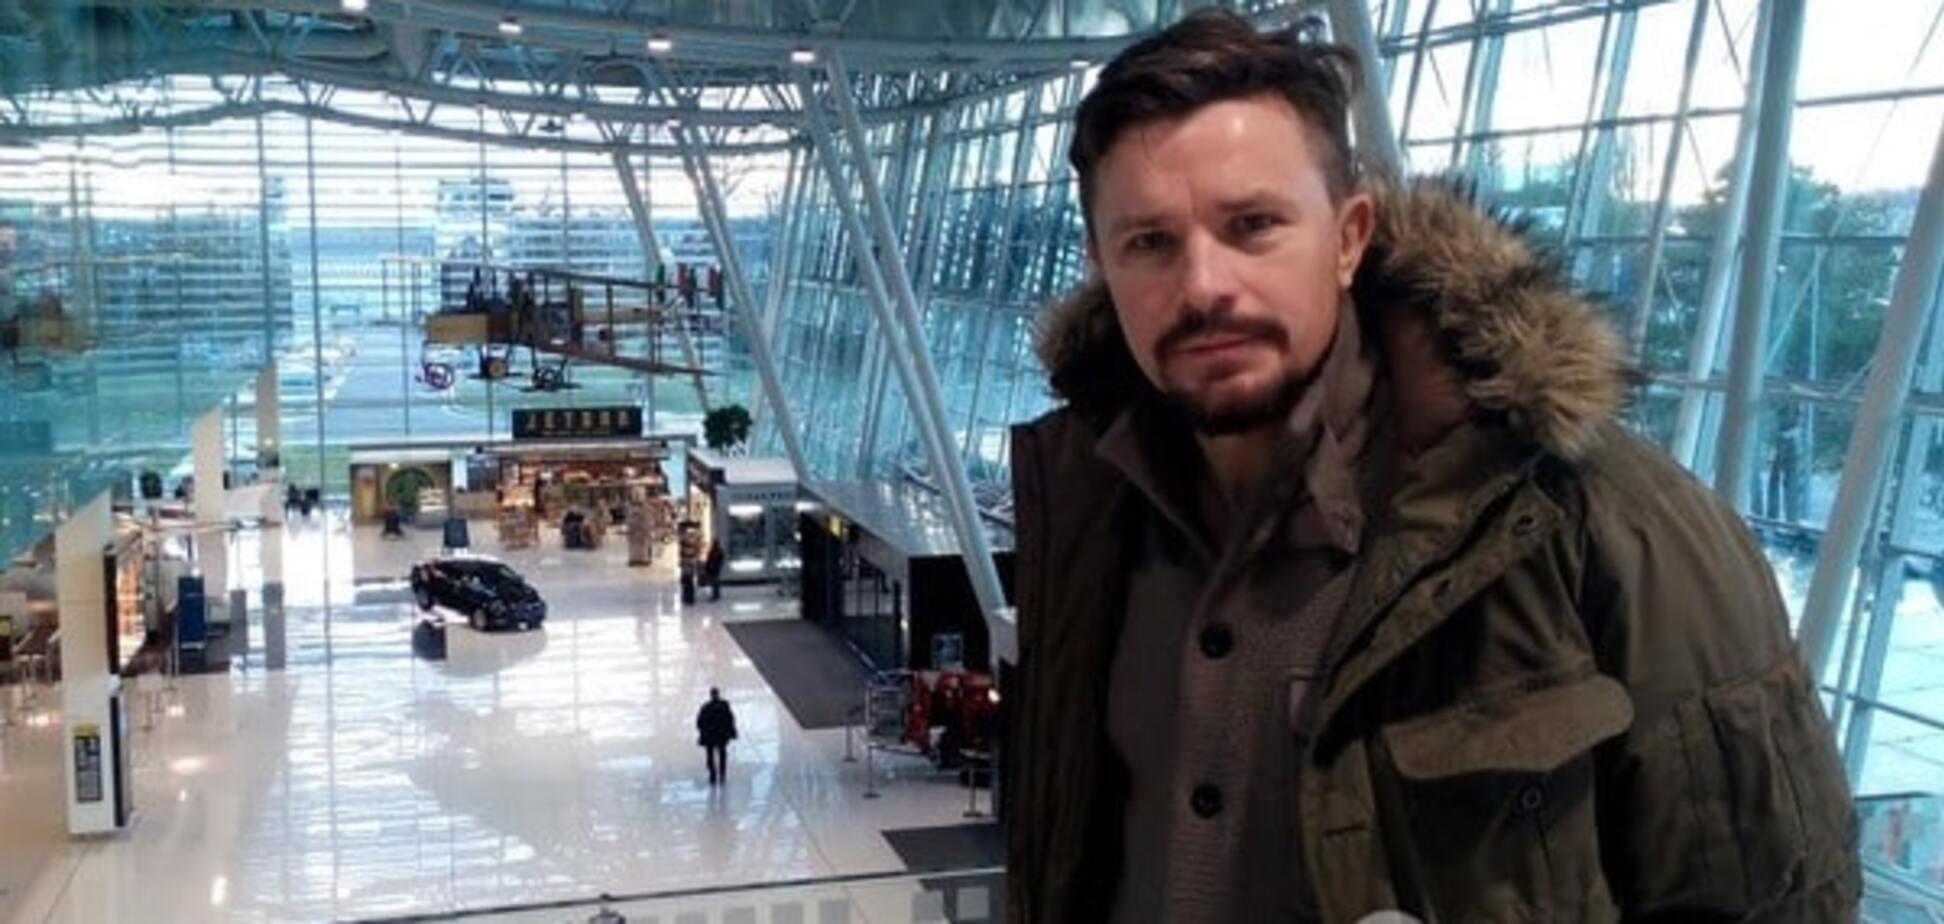 Звуки Братиславы: уборка снежинок, Задорнов и соцреализм